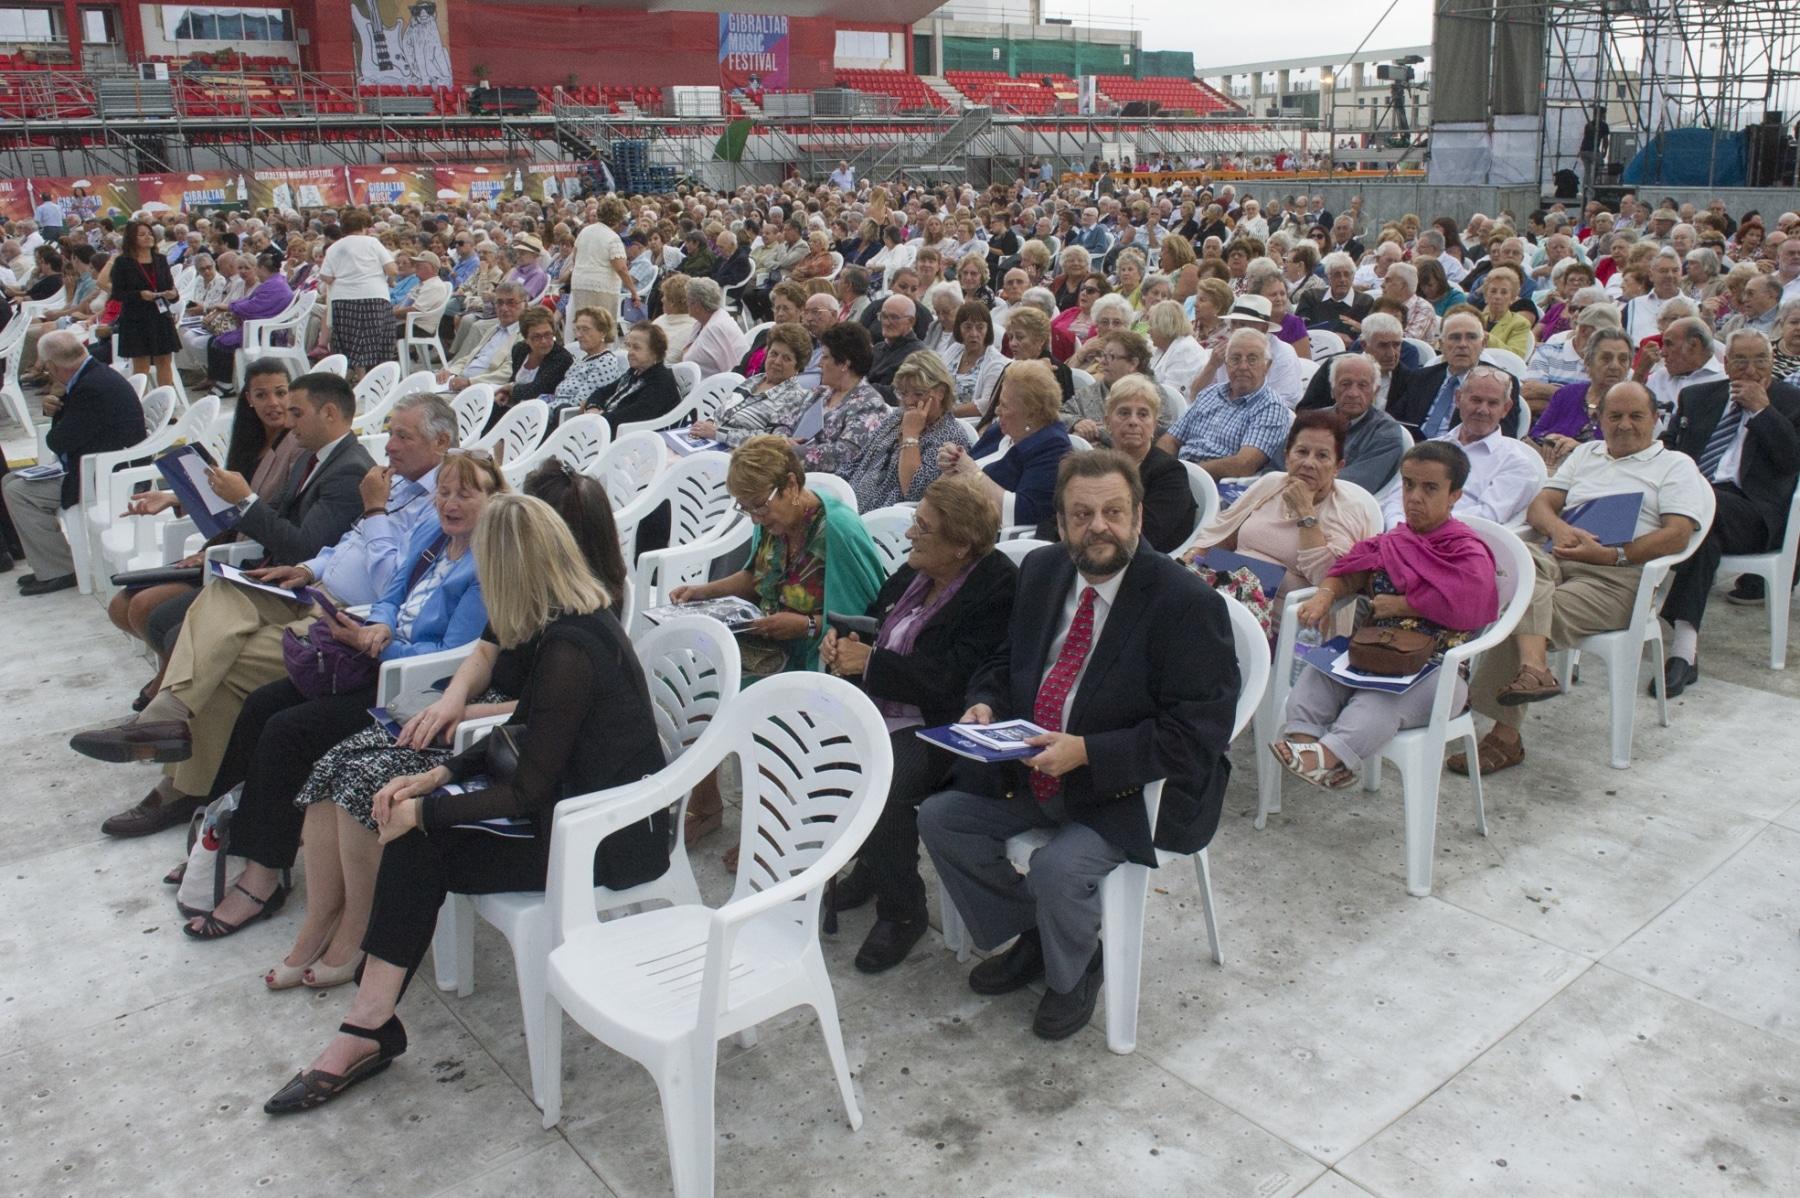 concierto-evacuados-de-gibraltar-07092015-8bn_21228484772_o